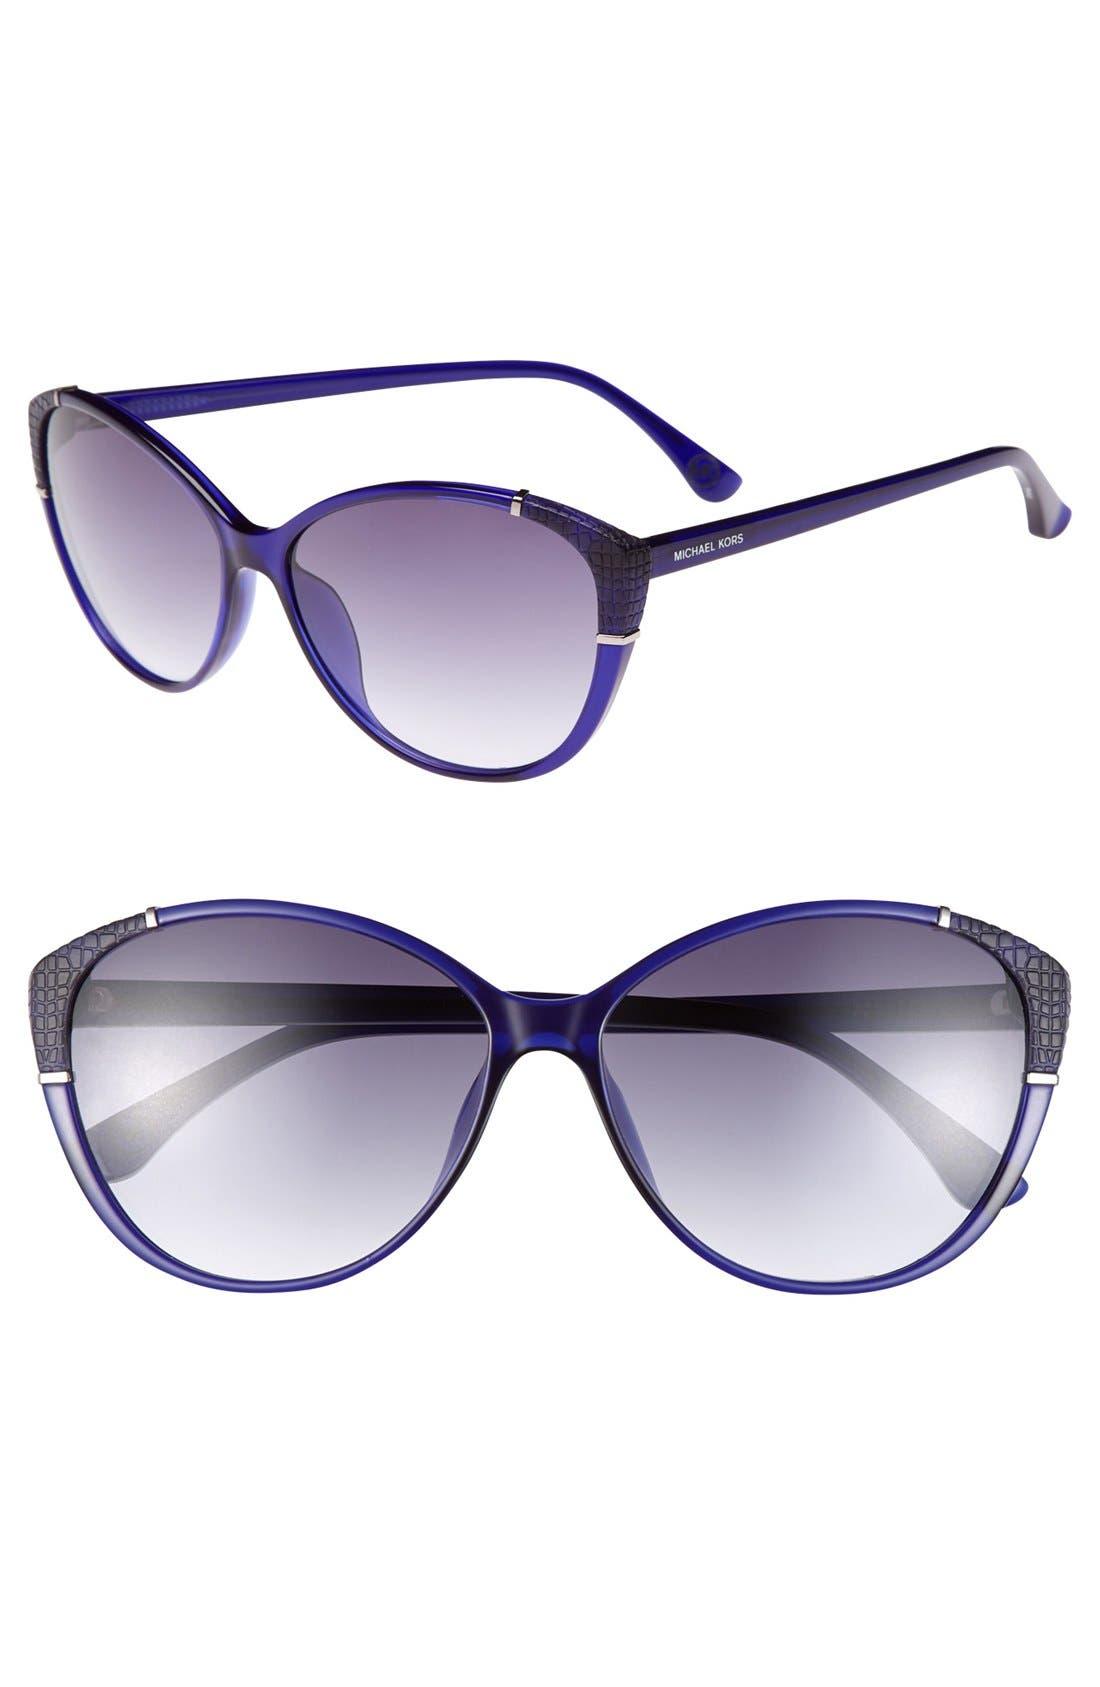 Main Image - MICHAEL Michael Kors 'Paige' 58mm Sunglasses